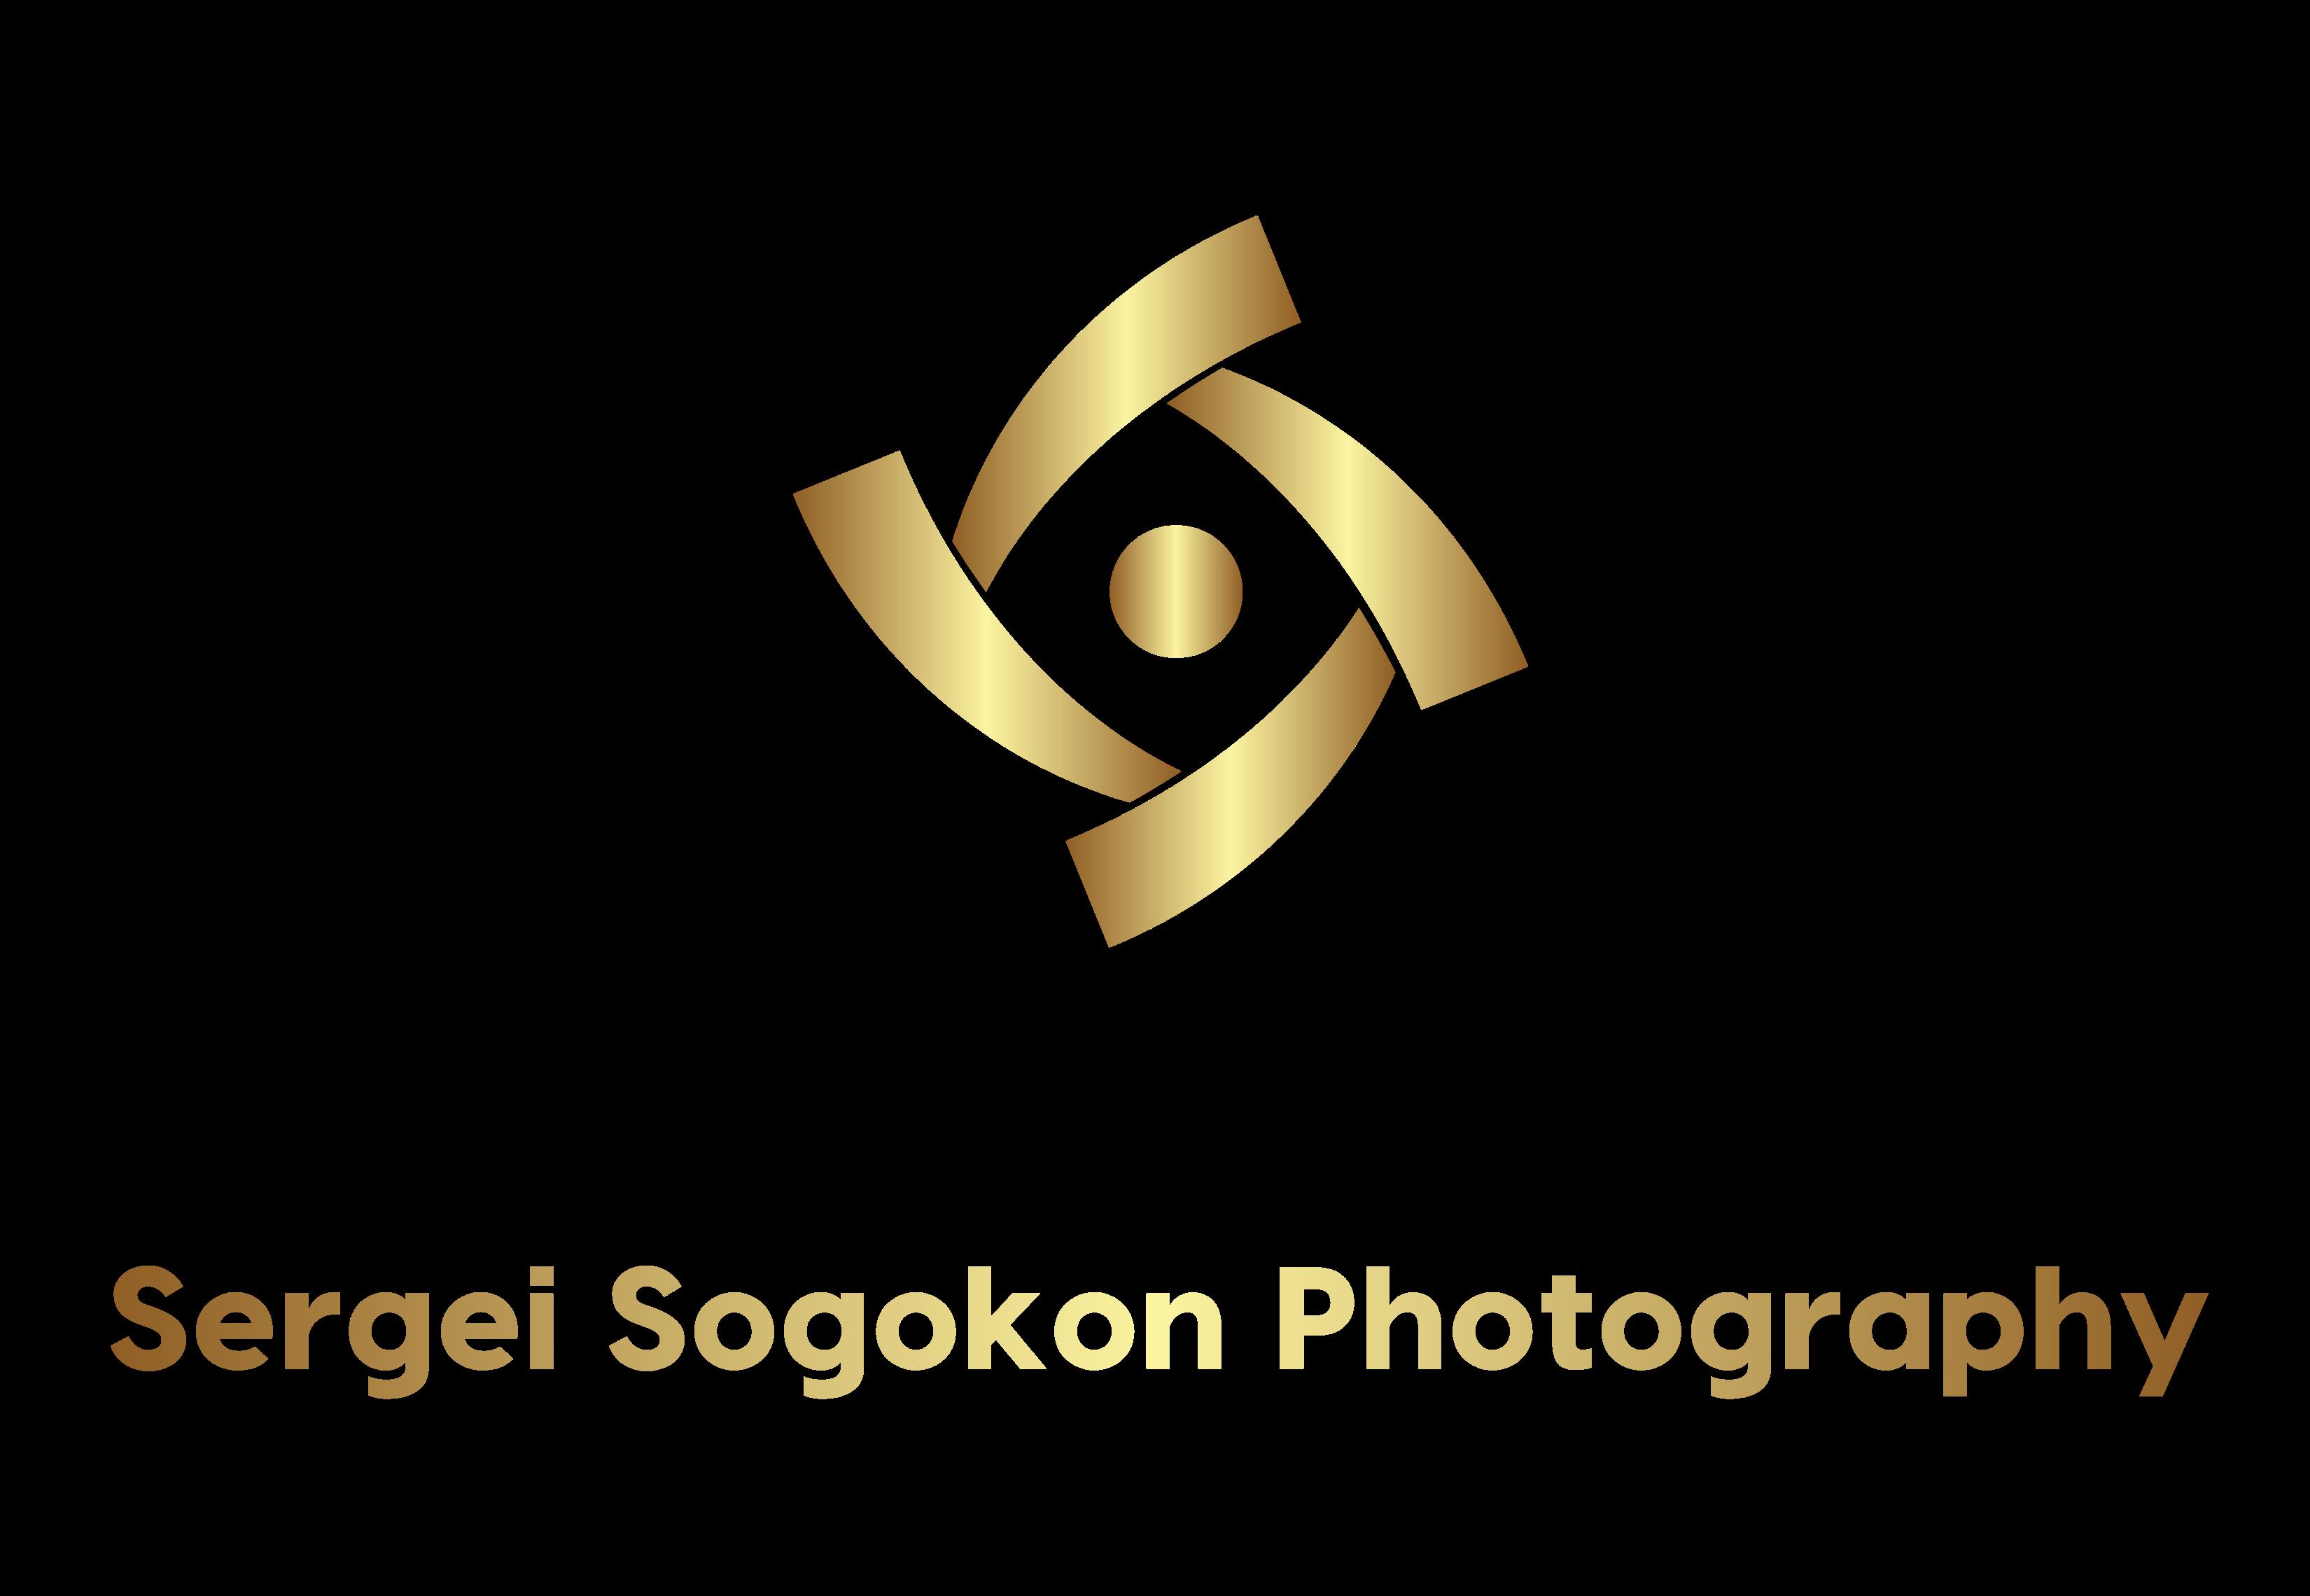 Sergei Sogokon Photography